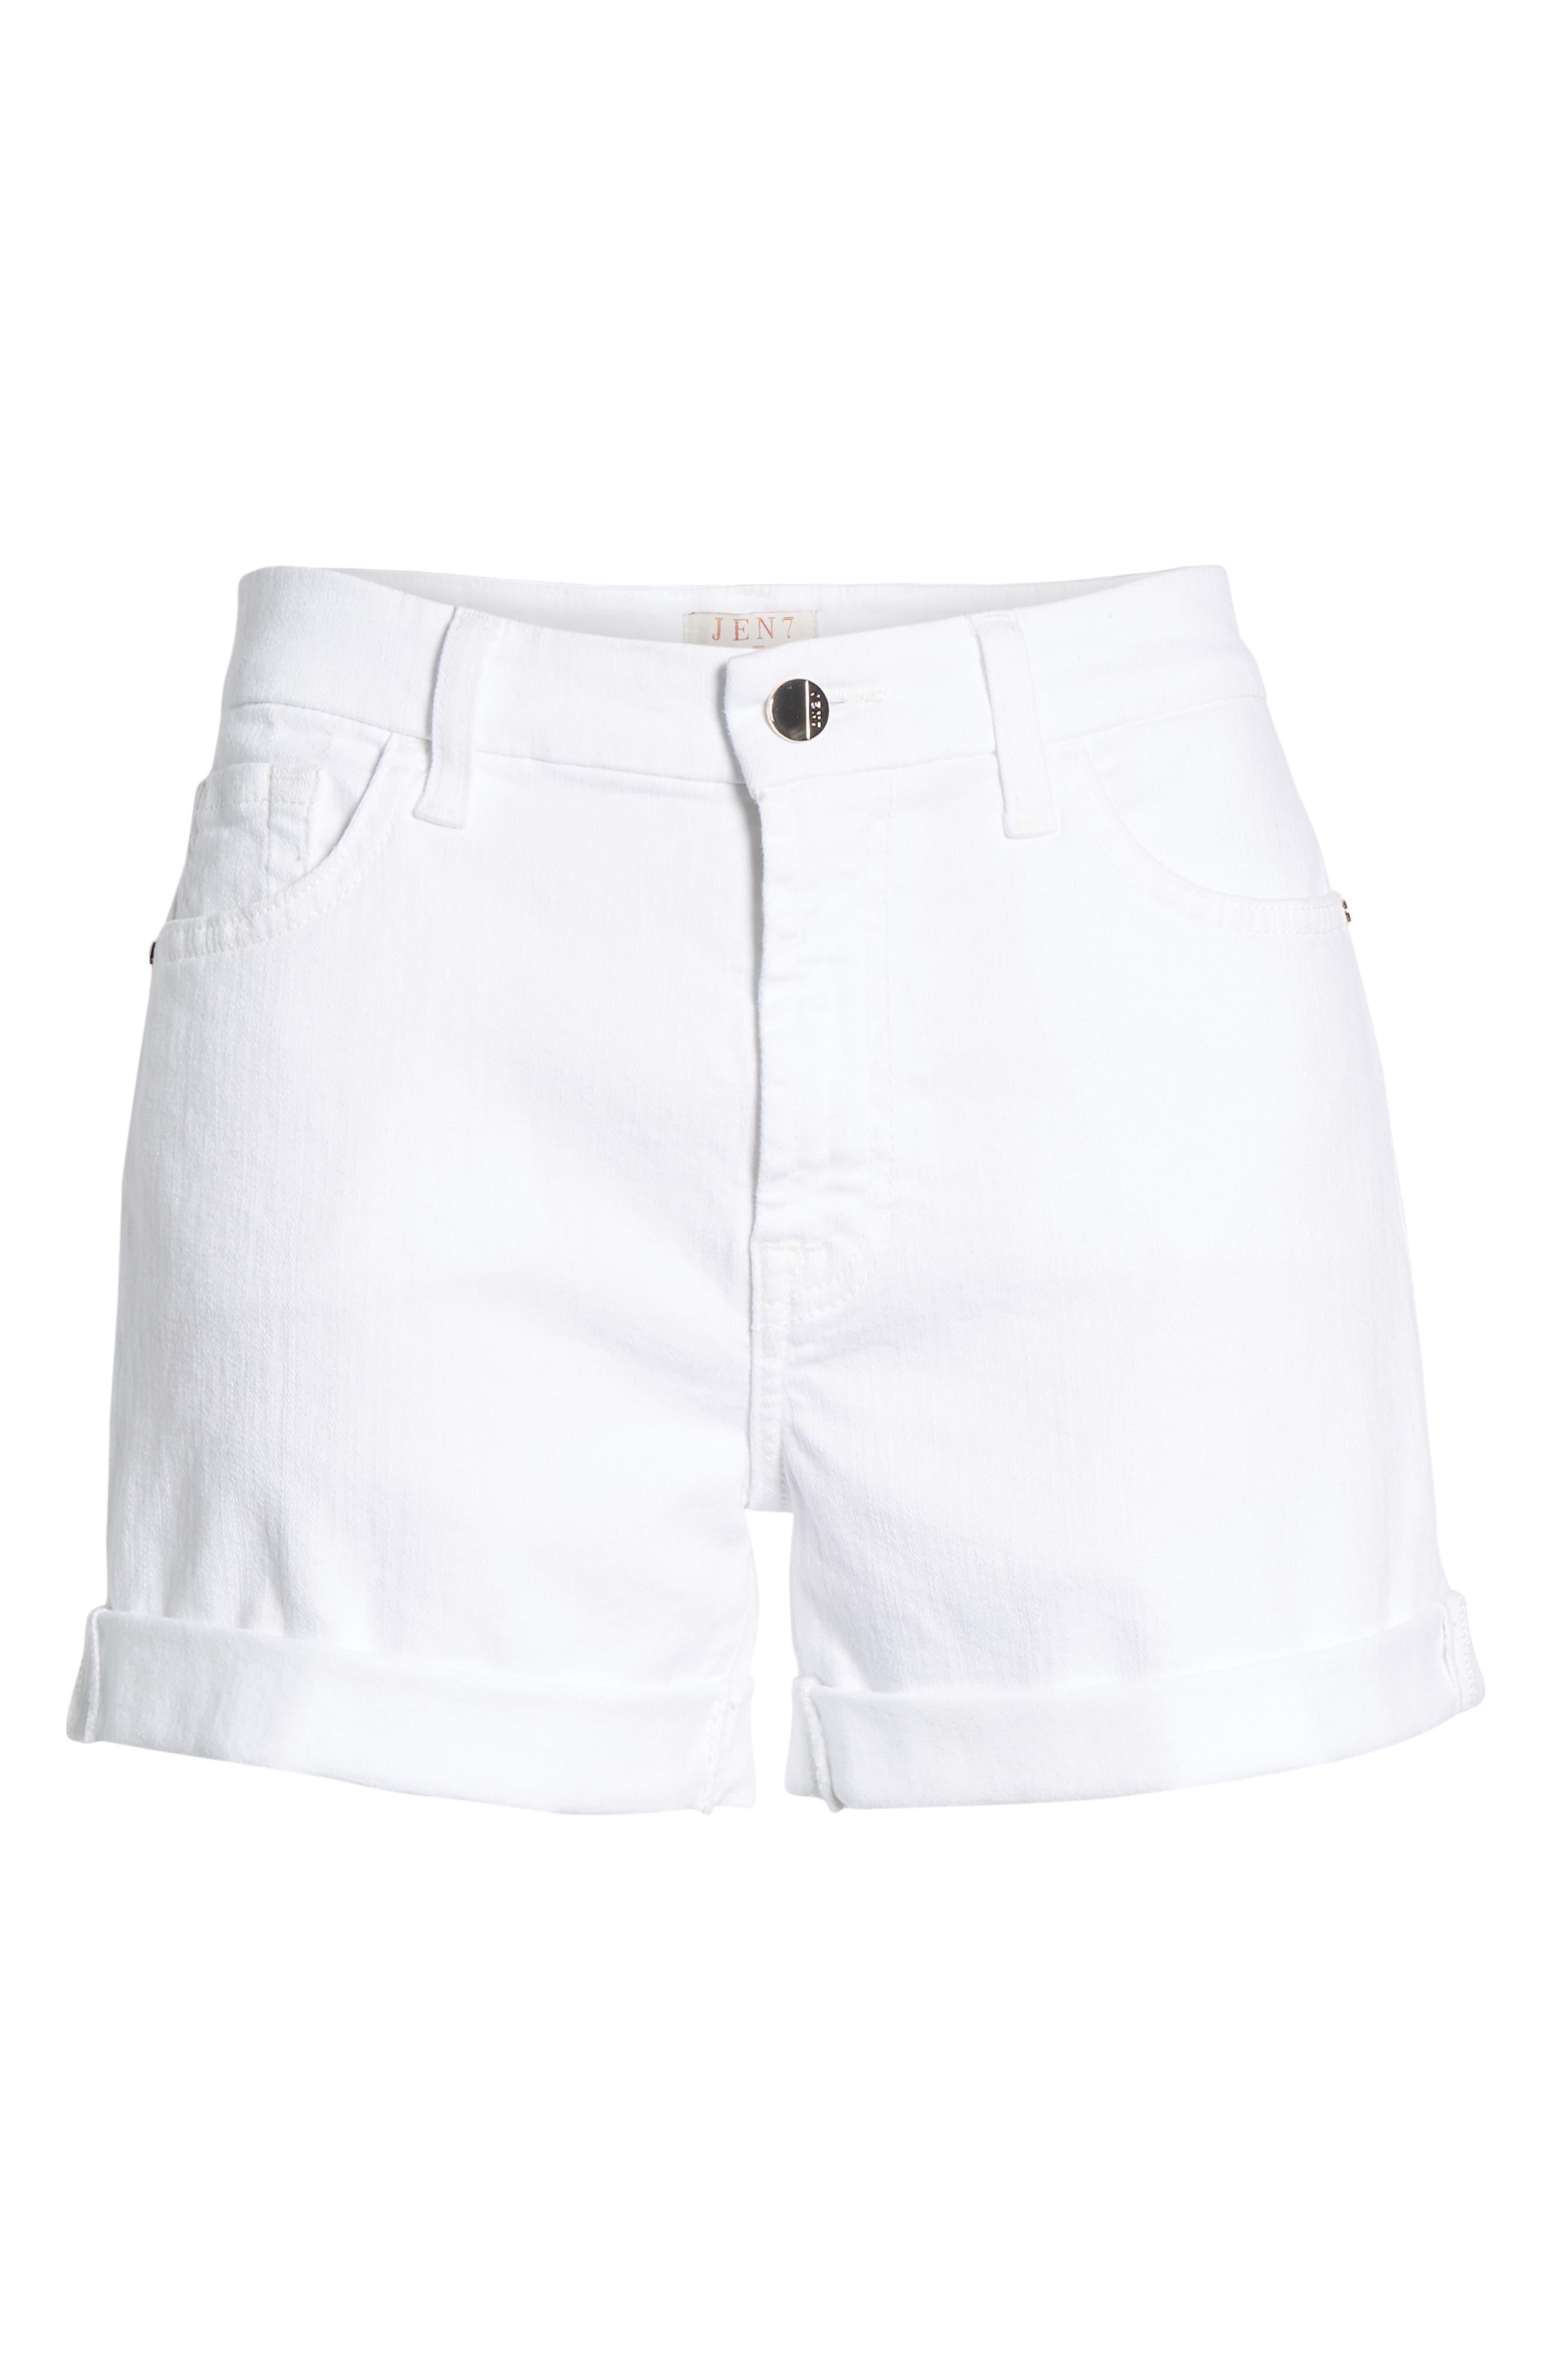 Rolled Denim Shorts,                             Alternate thumbnail 6, color,                             White